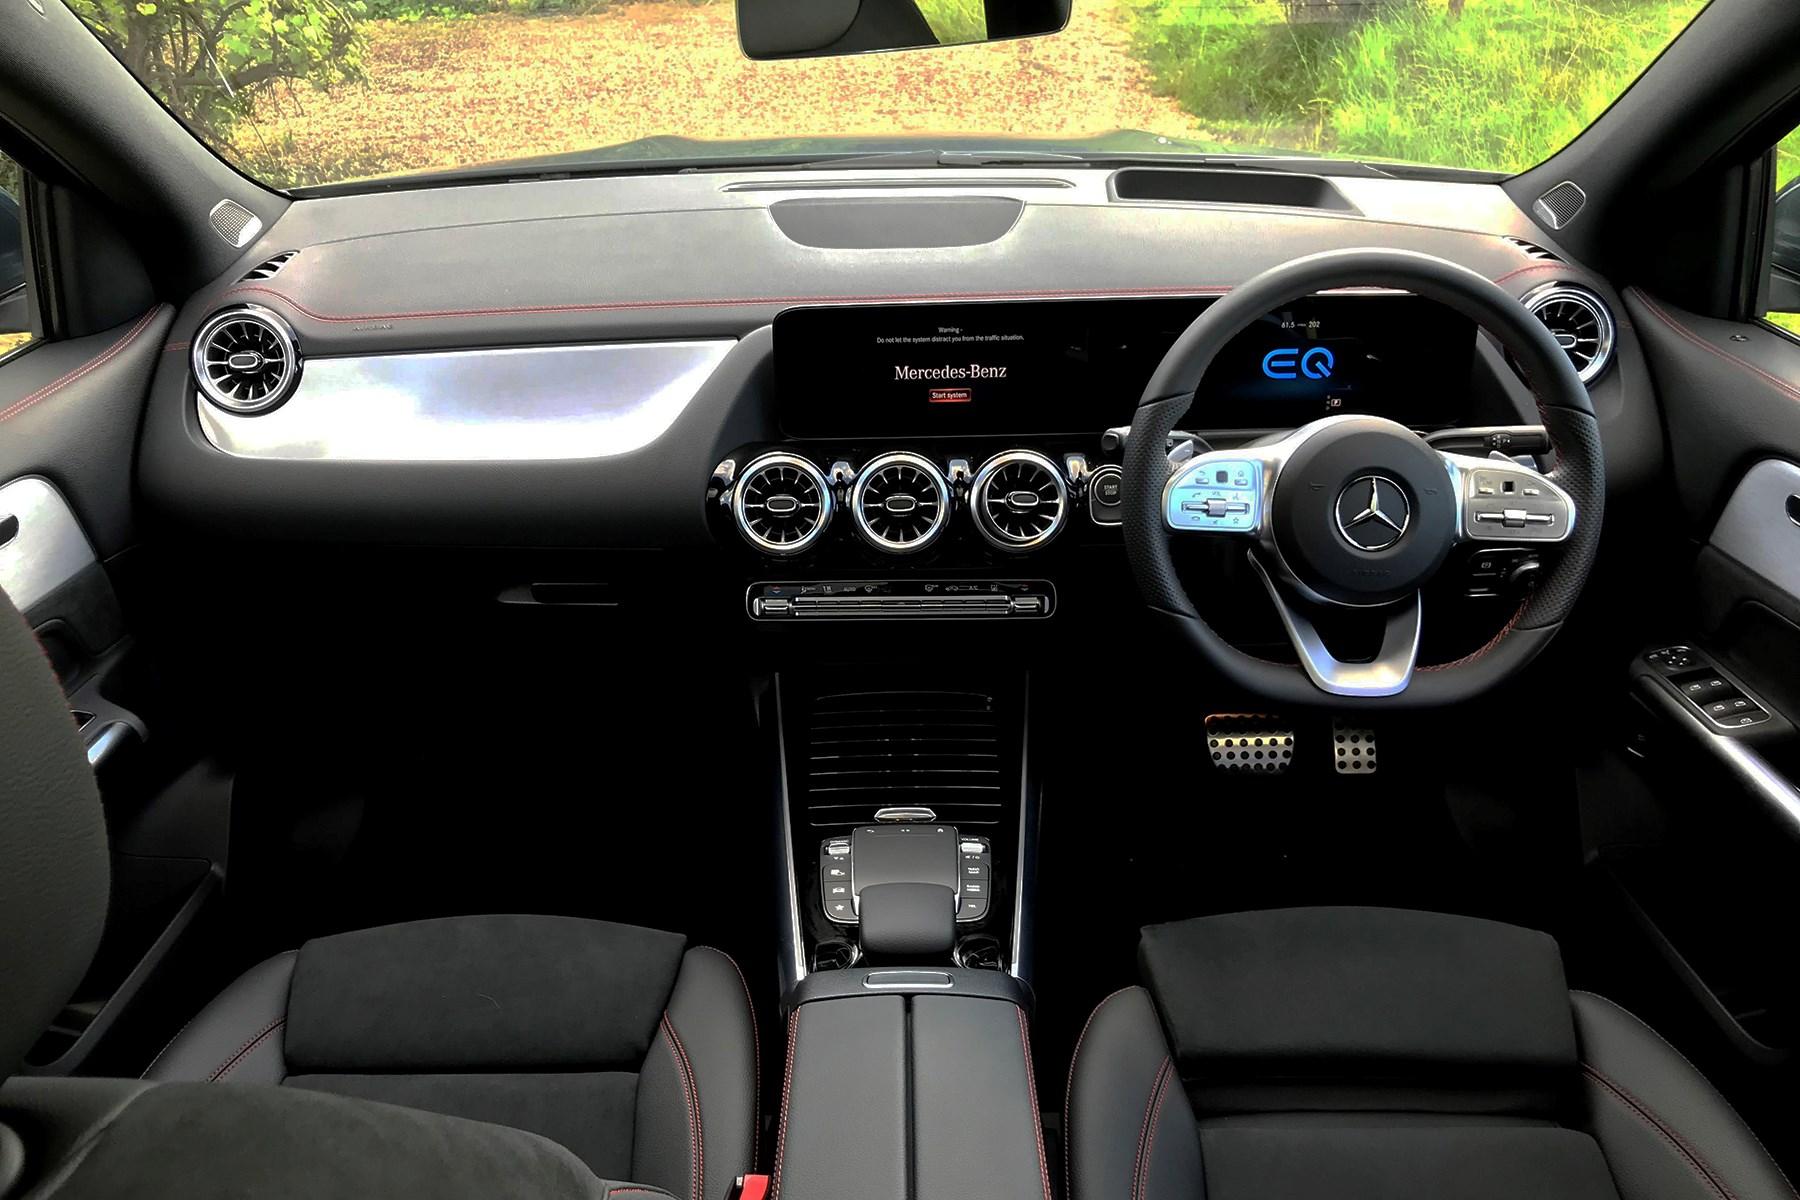 Mercedes-Benz EQA 250 (2021) interior view